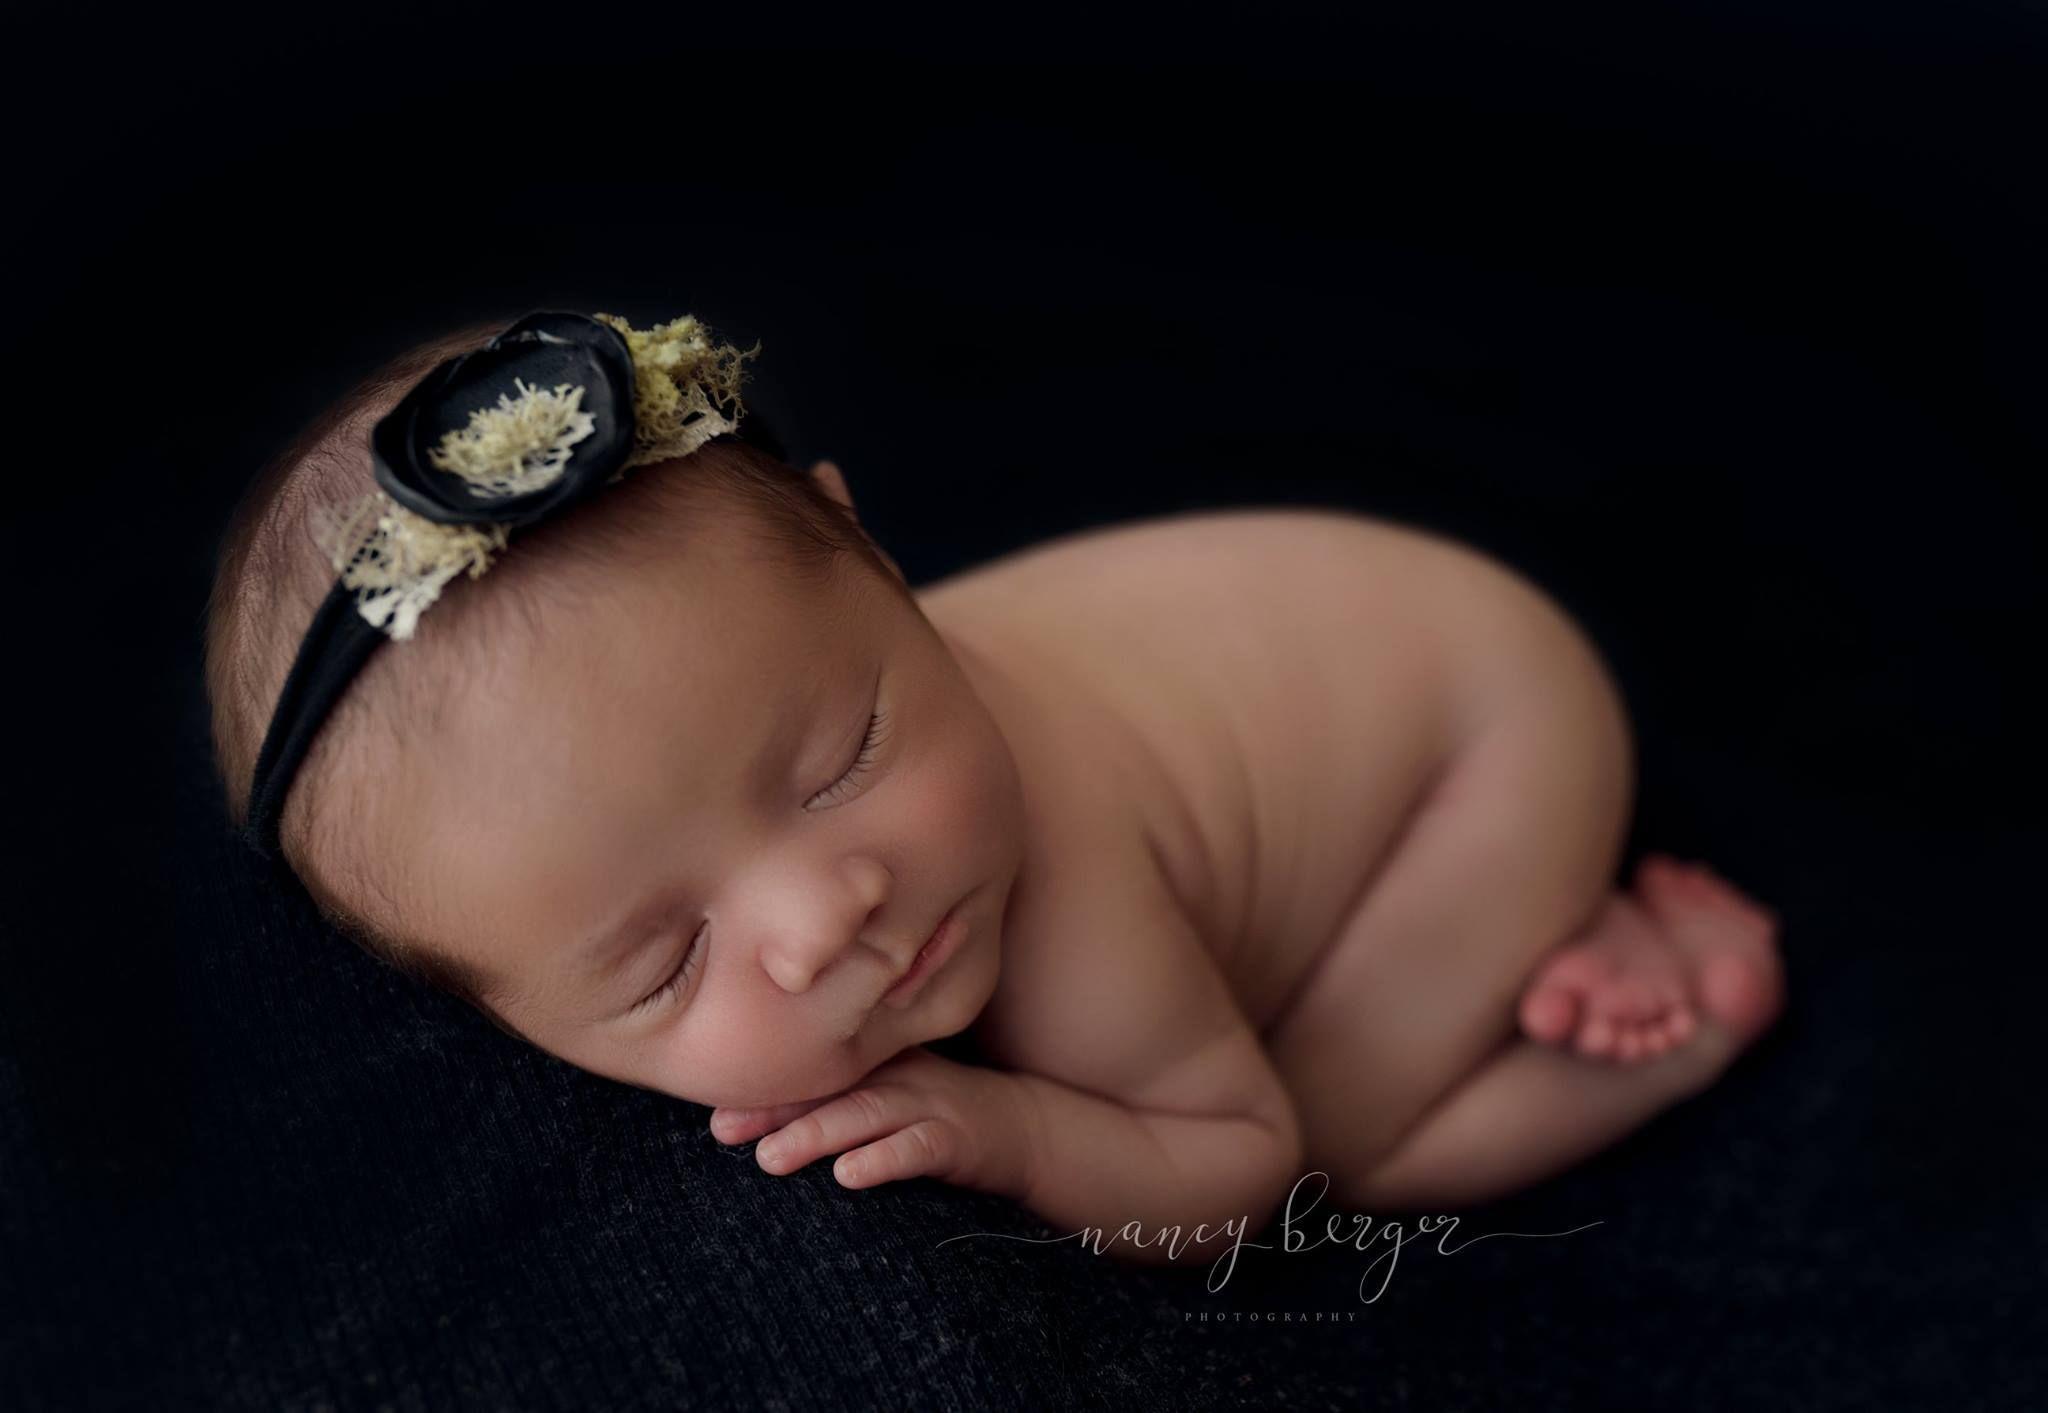 Black newborn tieback organic newborn photography newborn session newborn art newborn portraits newborn photographer organic newborn props